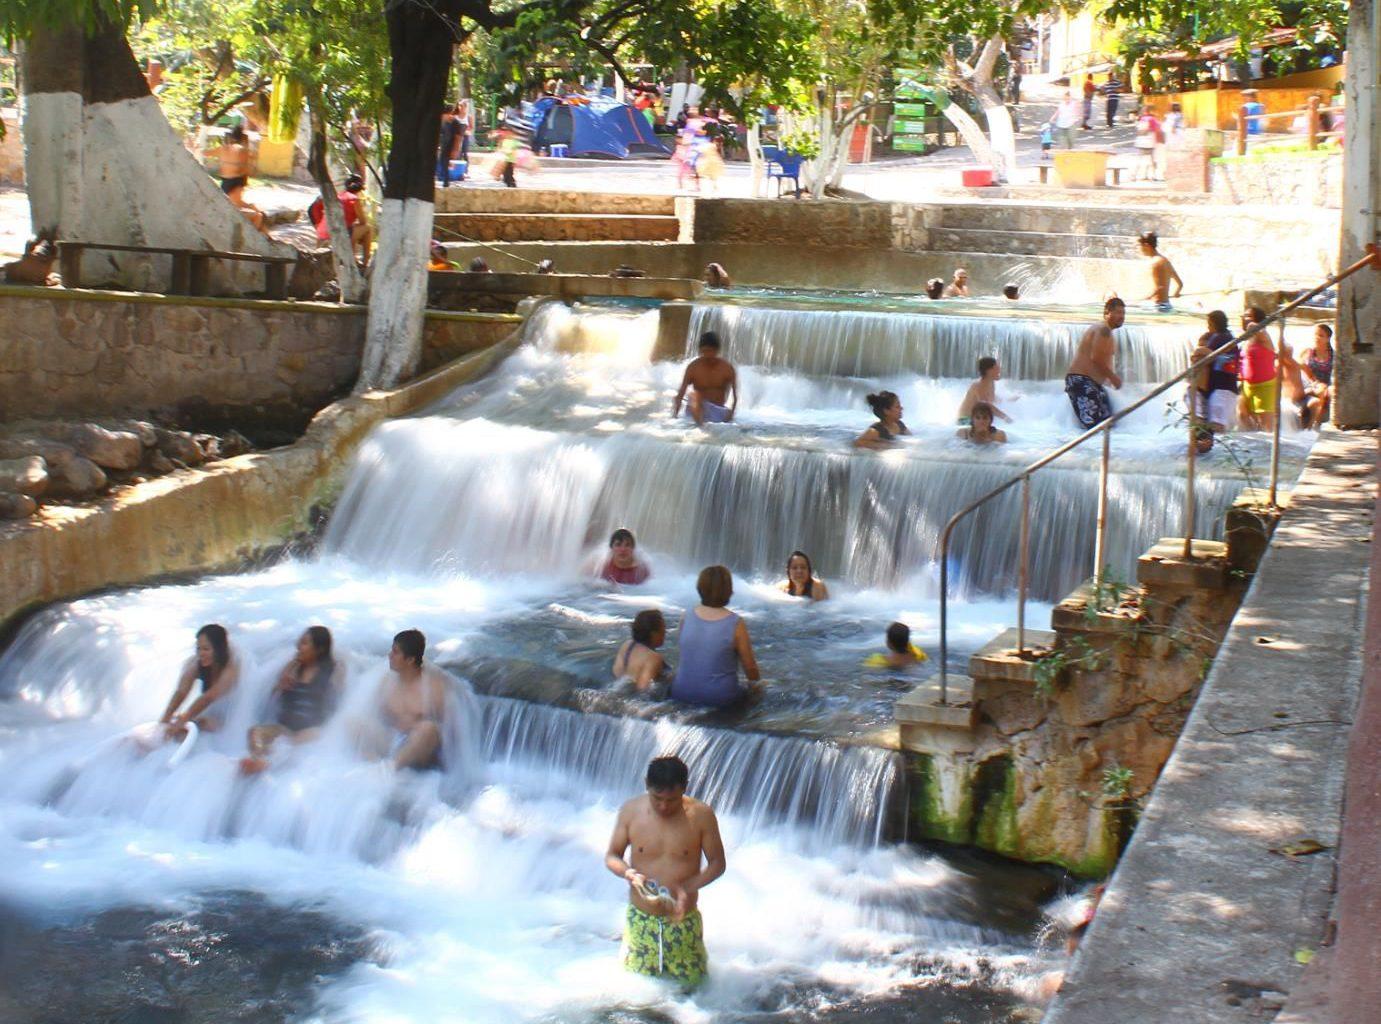 Aguas Termales del Balneario Las Huertas